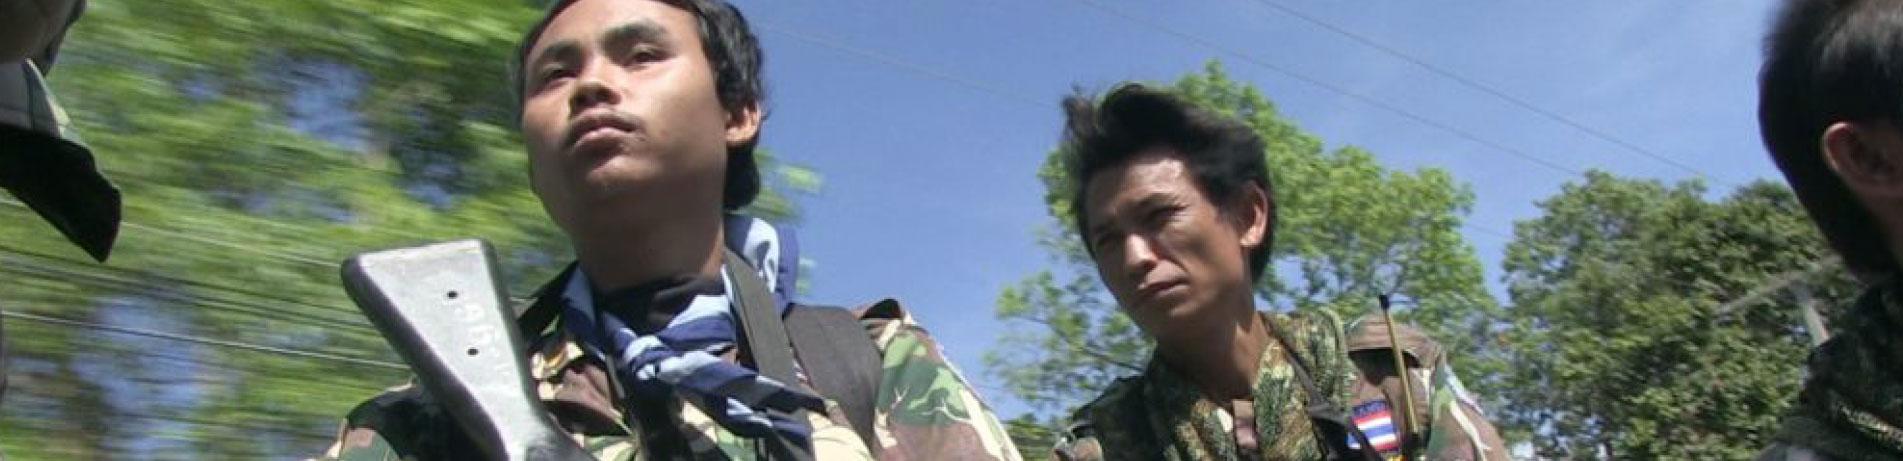 Armed rangers